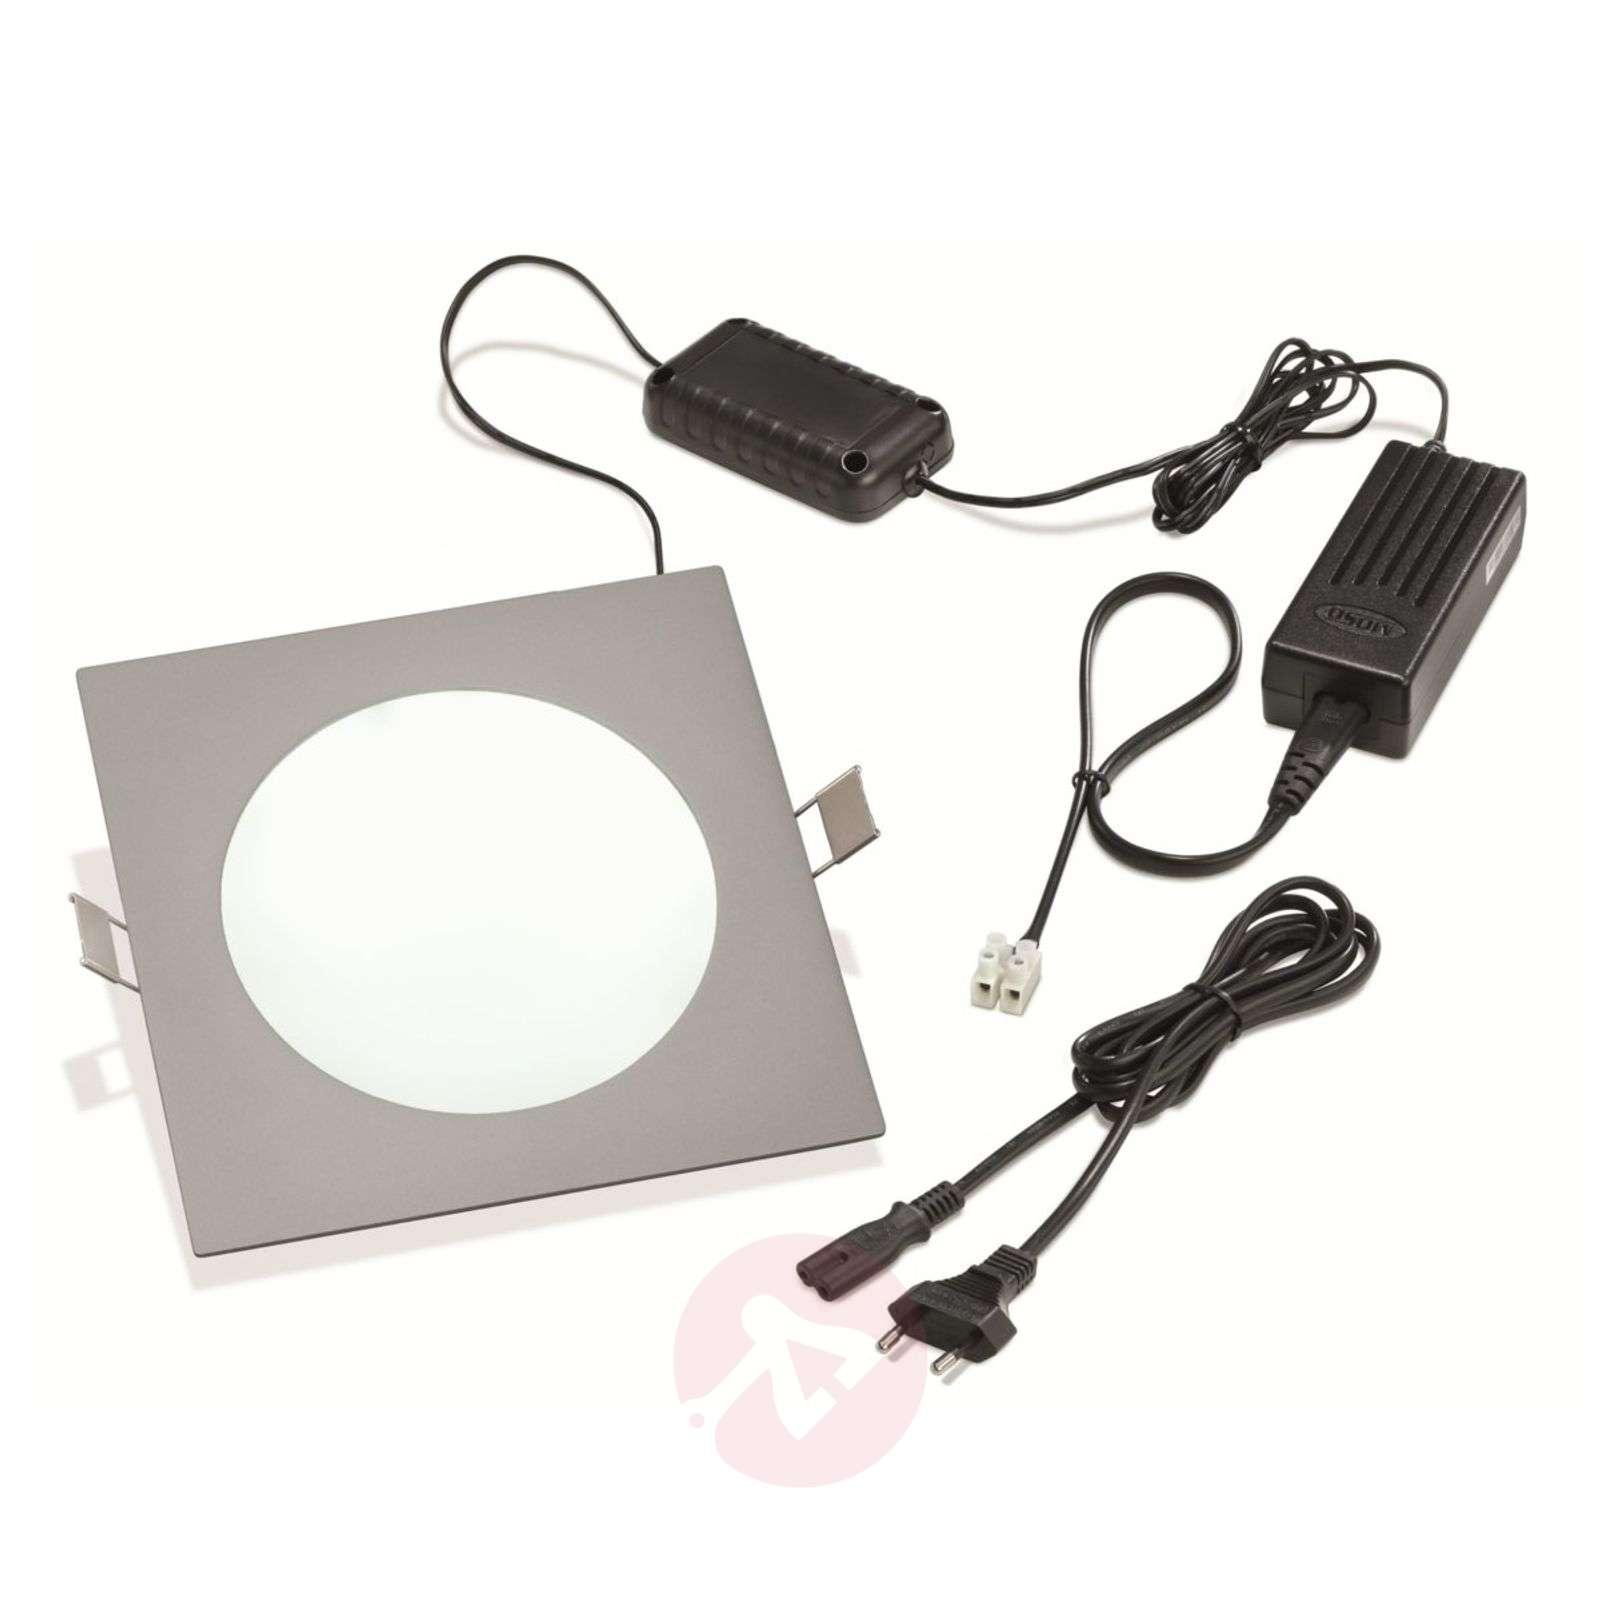 LED-uppovalaisin PRINCE, nelikulmainen 11 W-3012182X-01